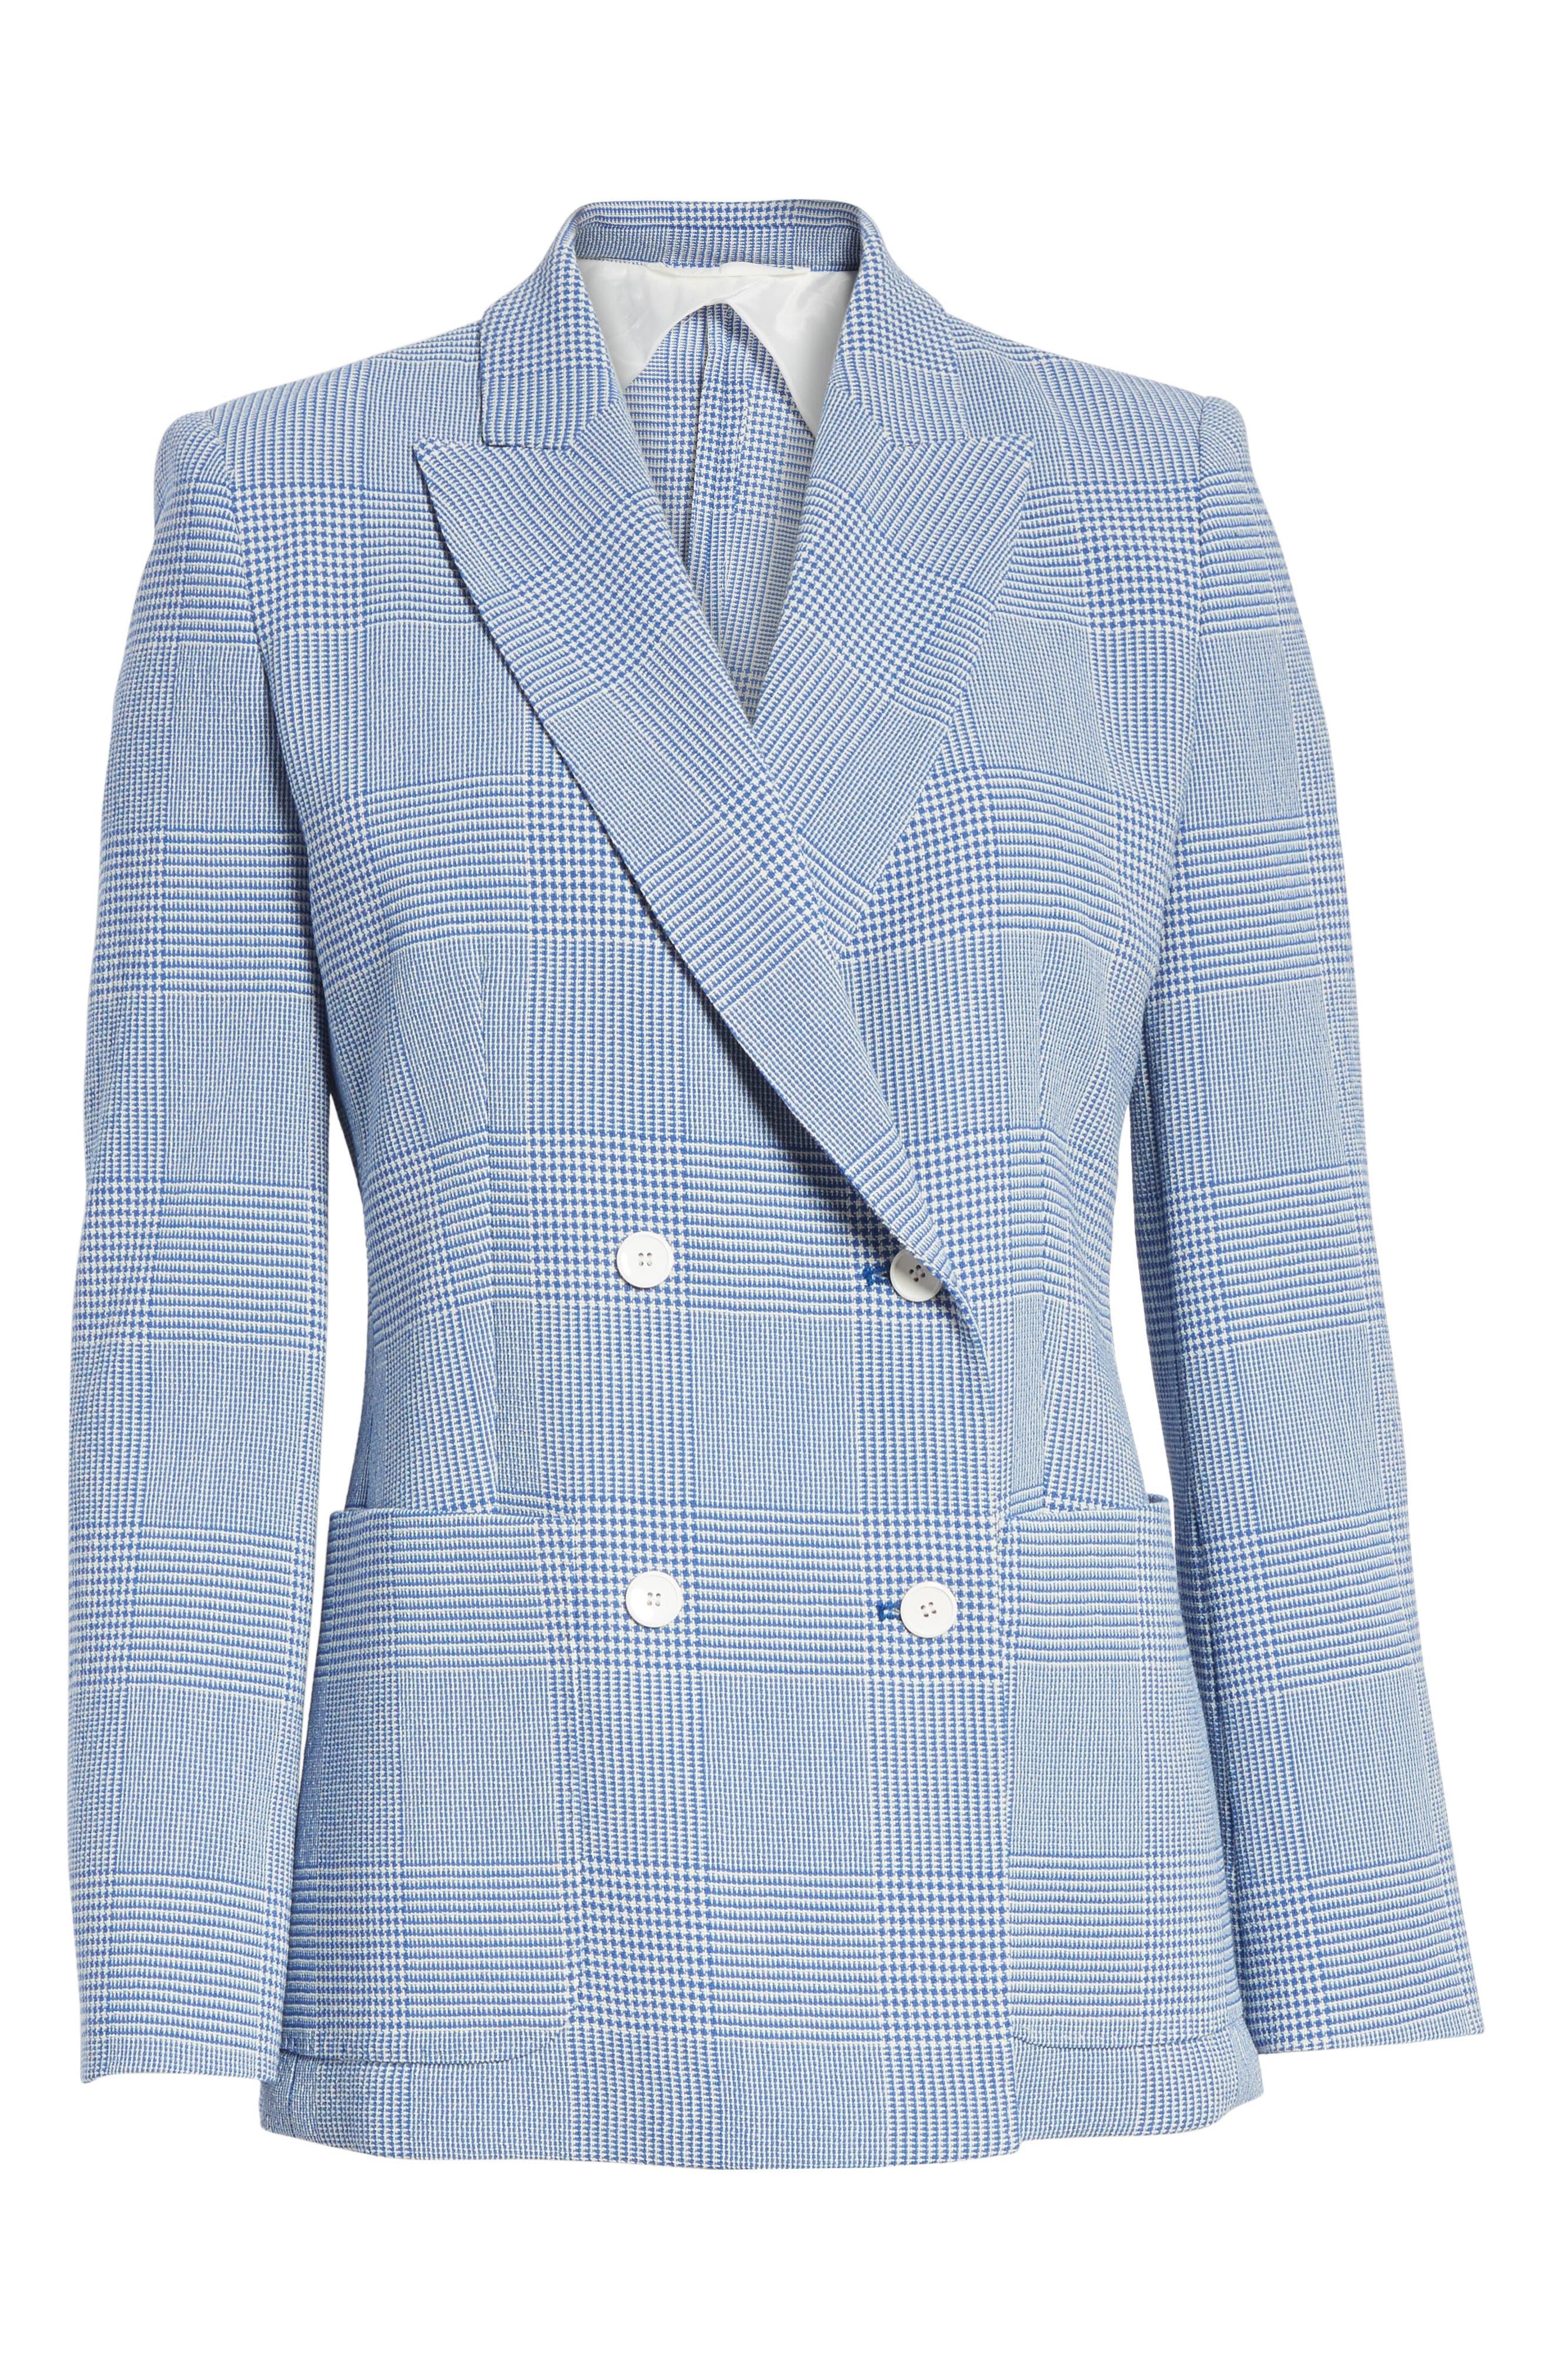 Ballata Check Wool Blazer,                             Alternate thumbnail 5, color,                             404